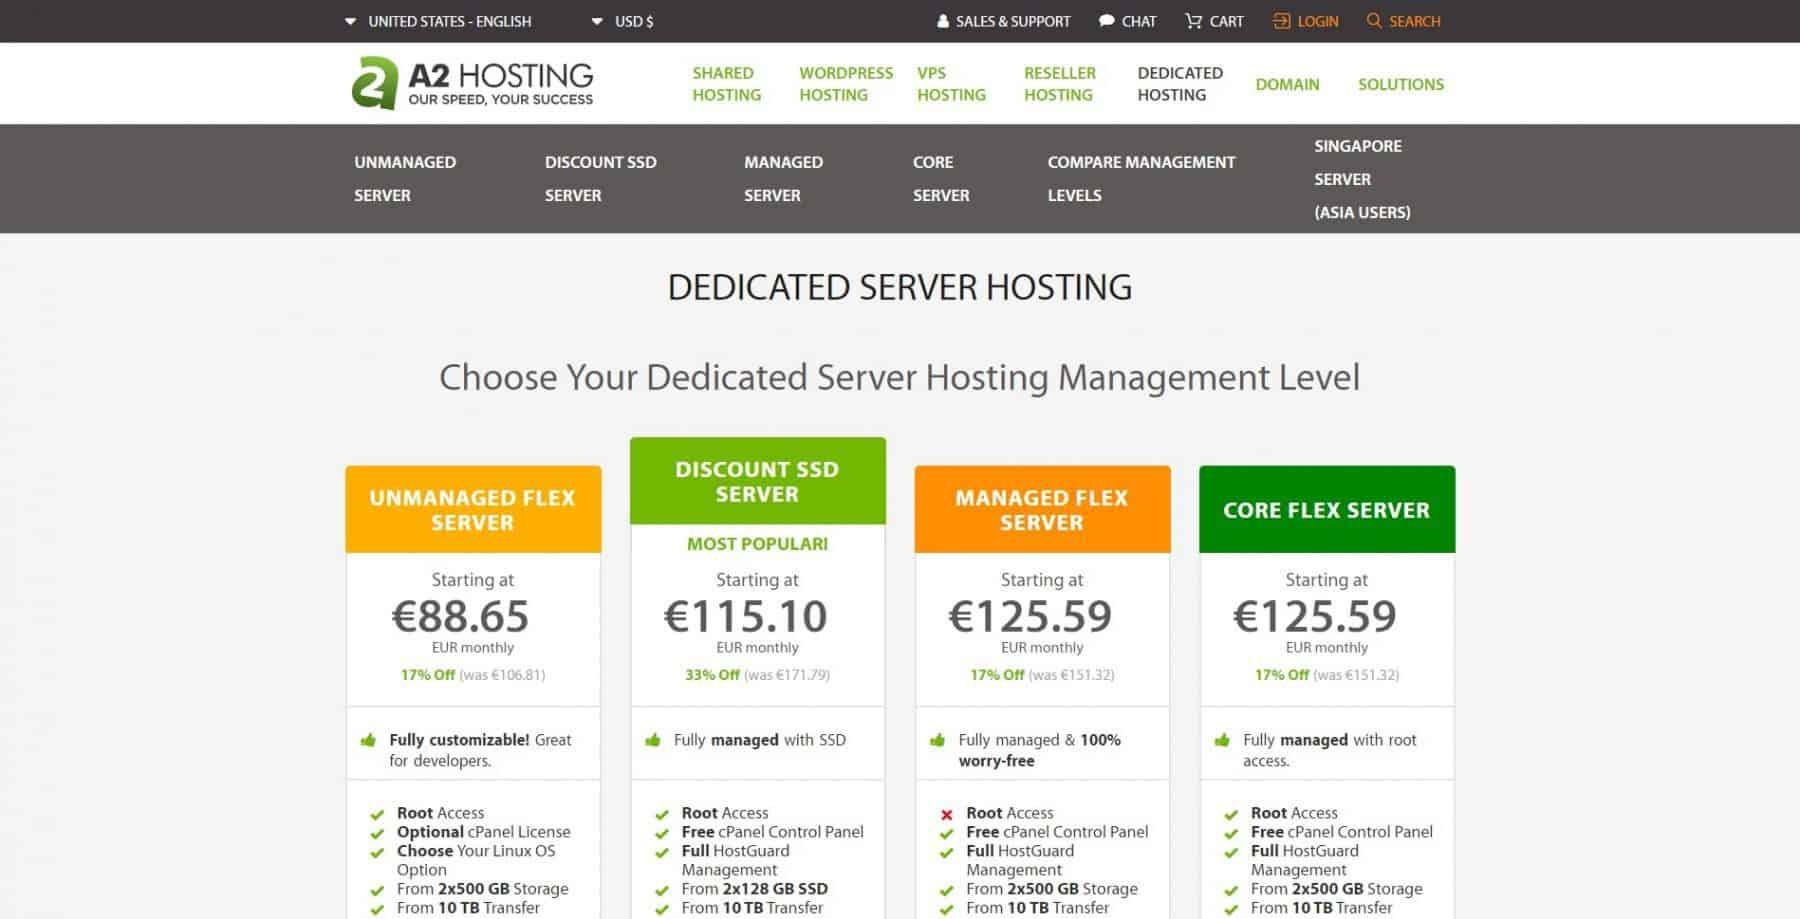 a2 hosting dedicated